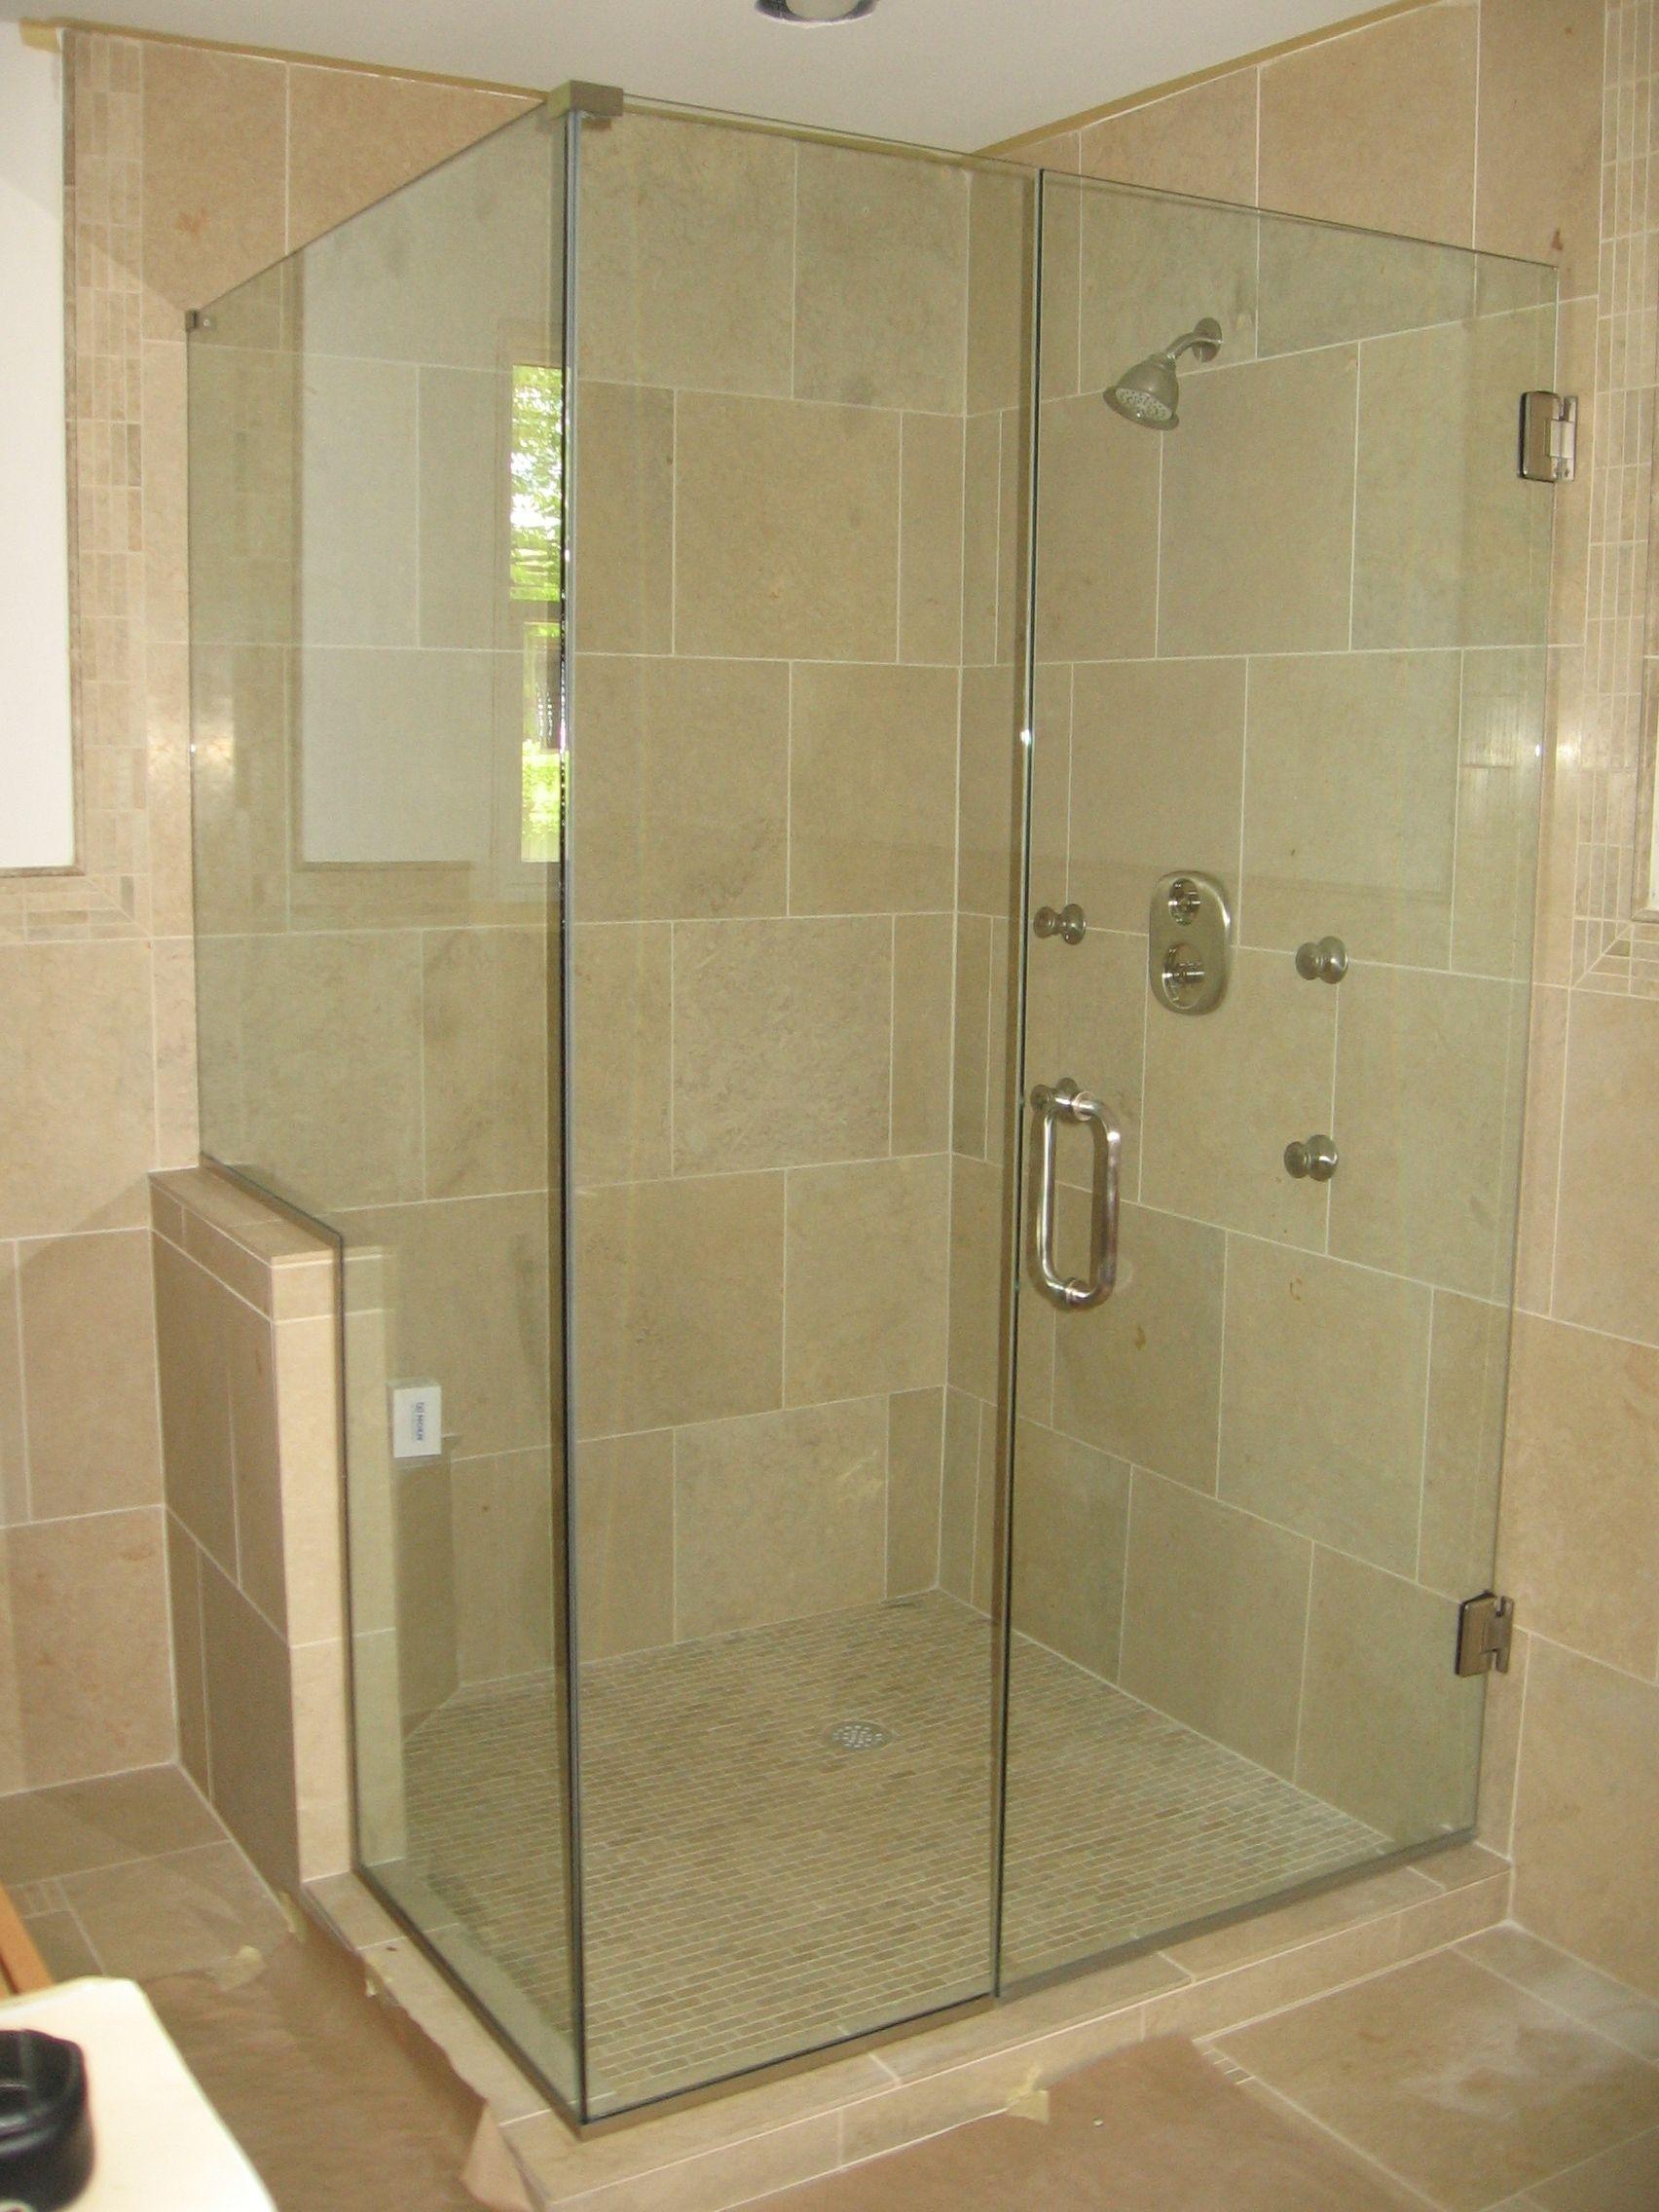 Custom 90 degree shower door, panel, and notched return